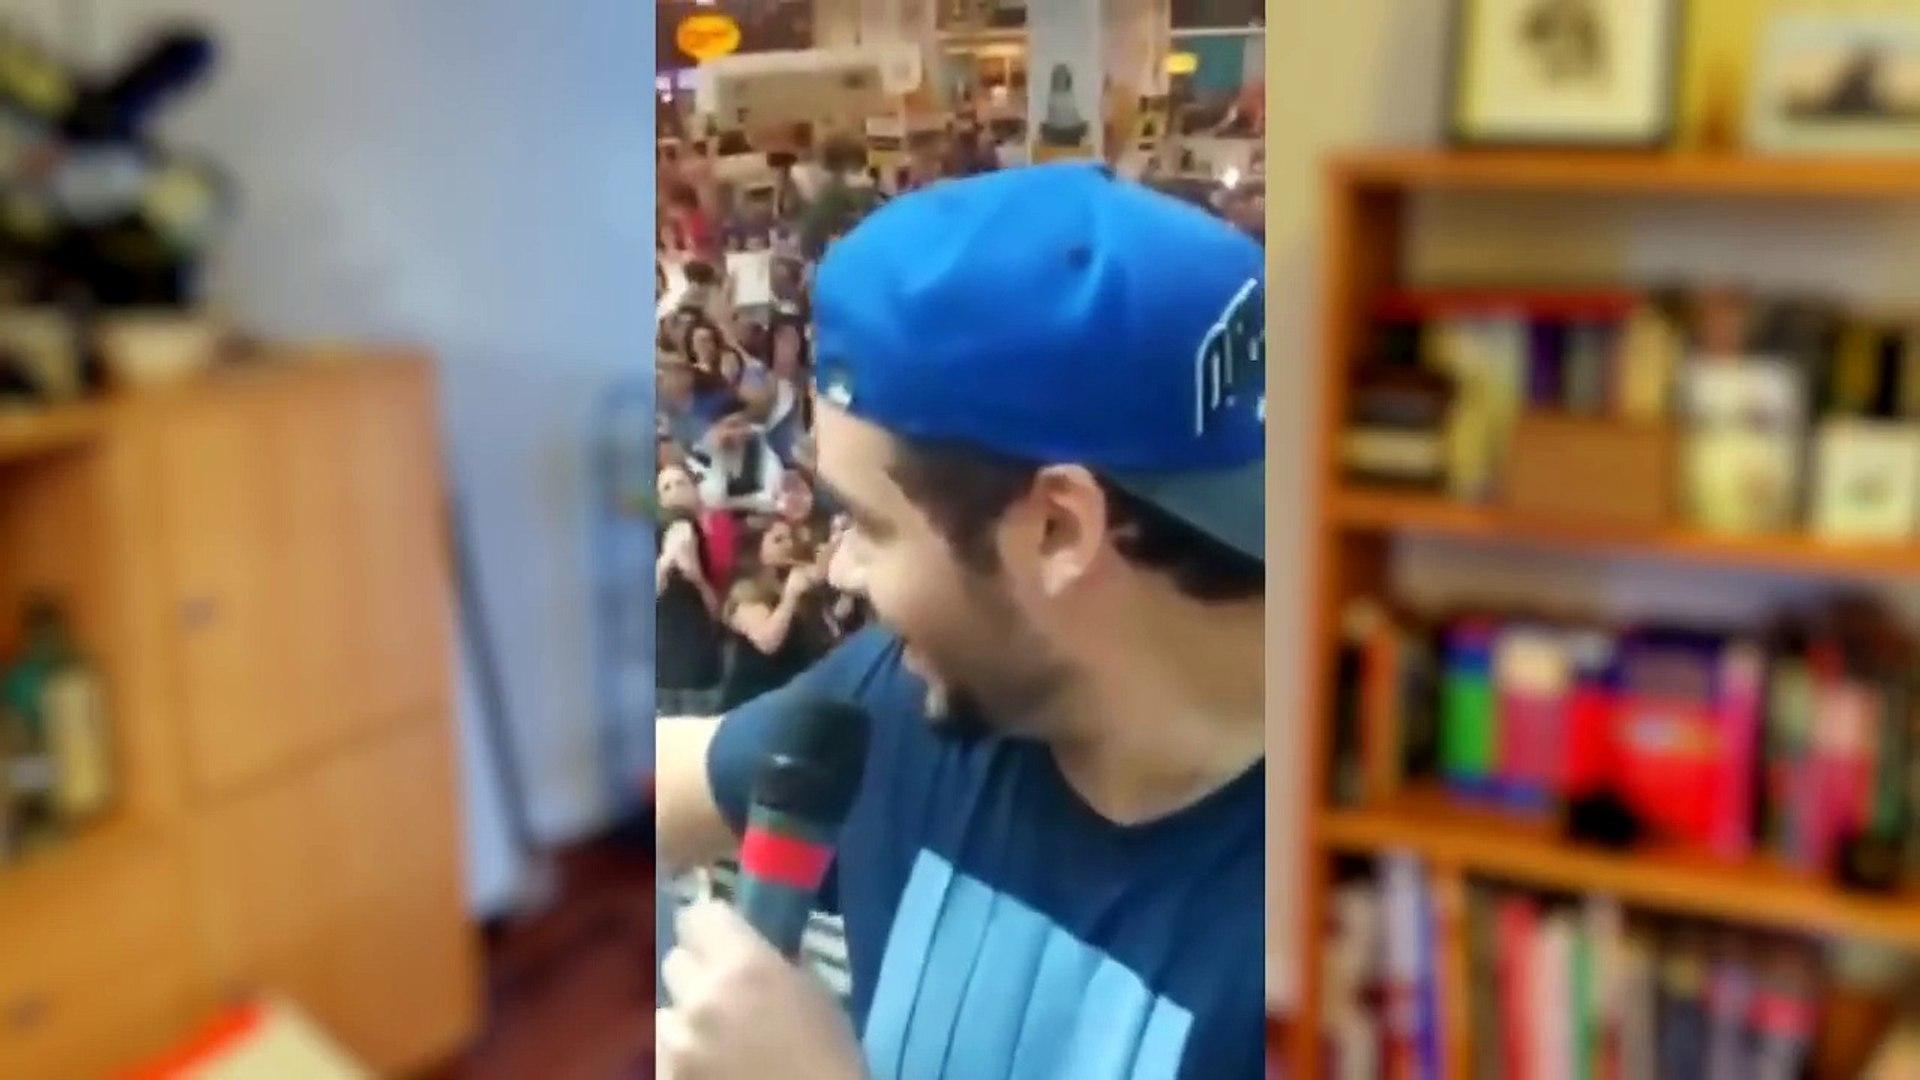 PC Siqueira alfineta Felipe Neto em vídeo, Felipe Neto troca farpas no Twitter